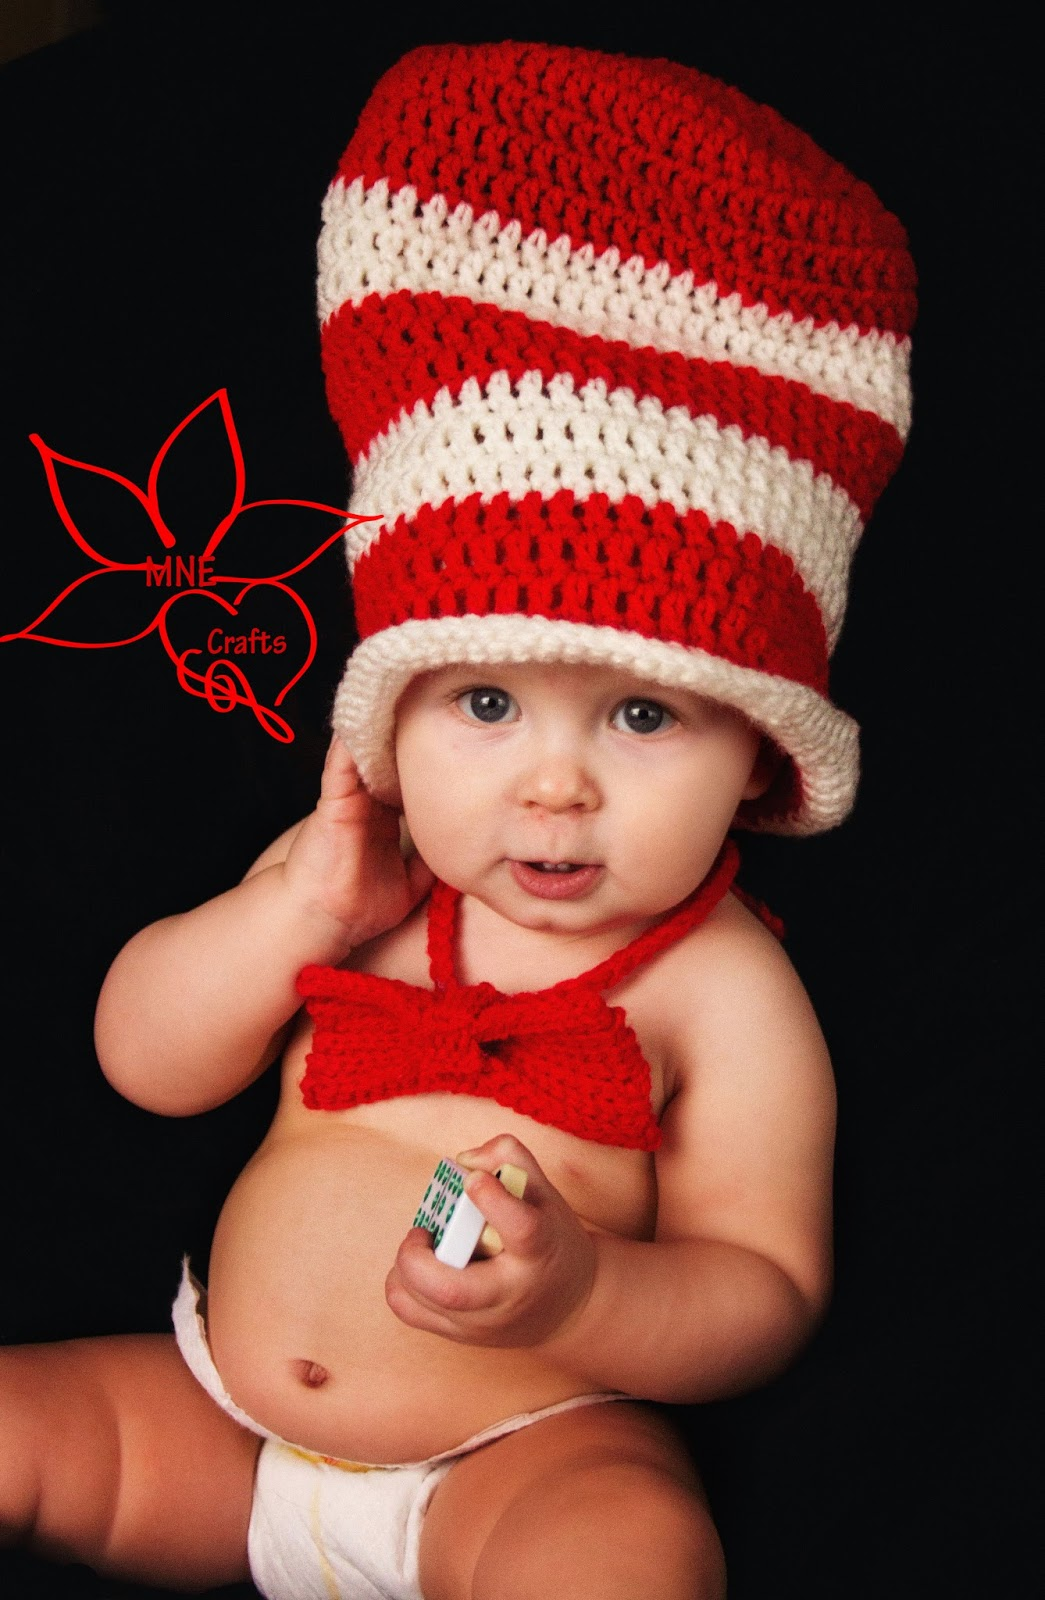 MNE Crafts: Cat in the Hat - Hat & Bow Tie Set